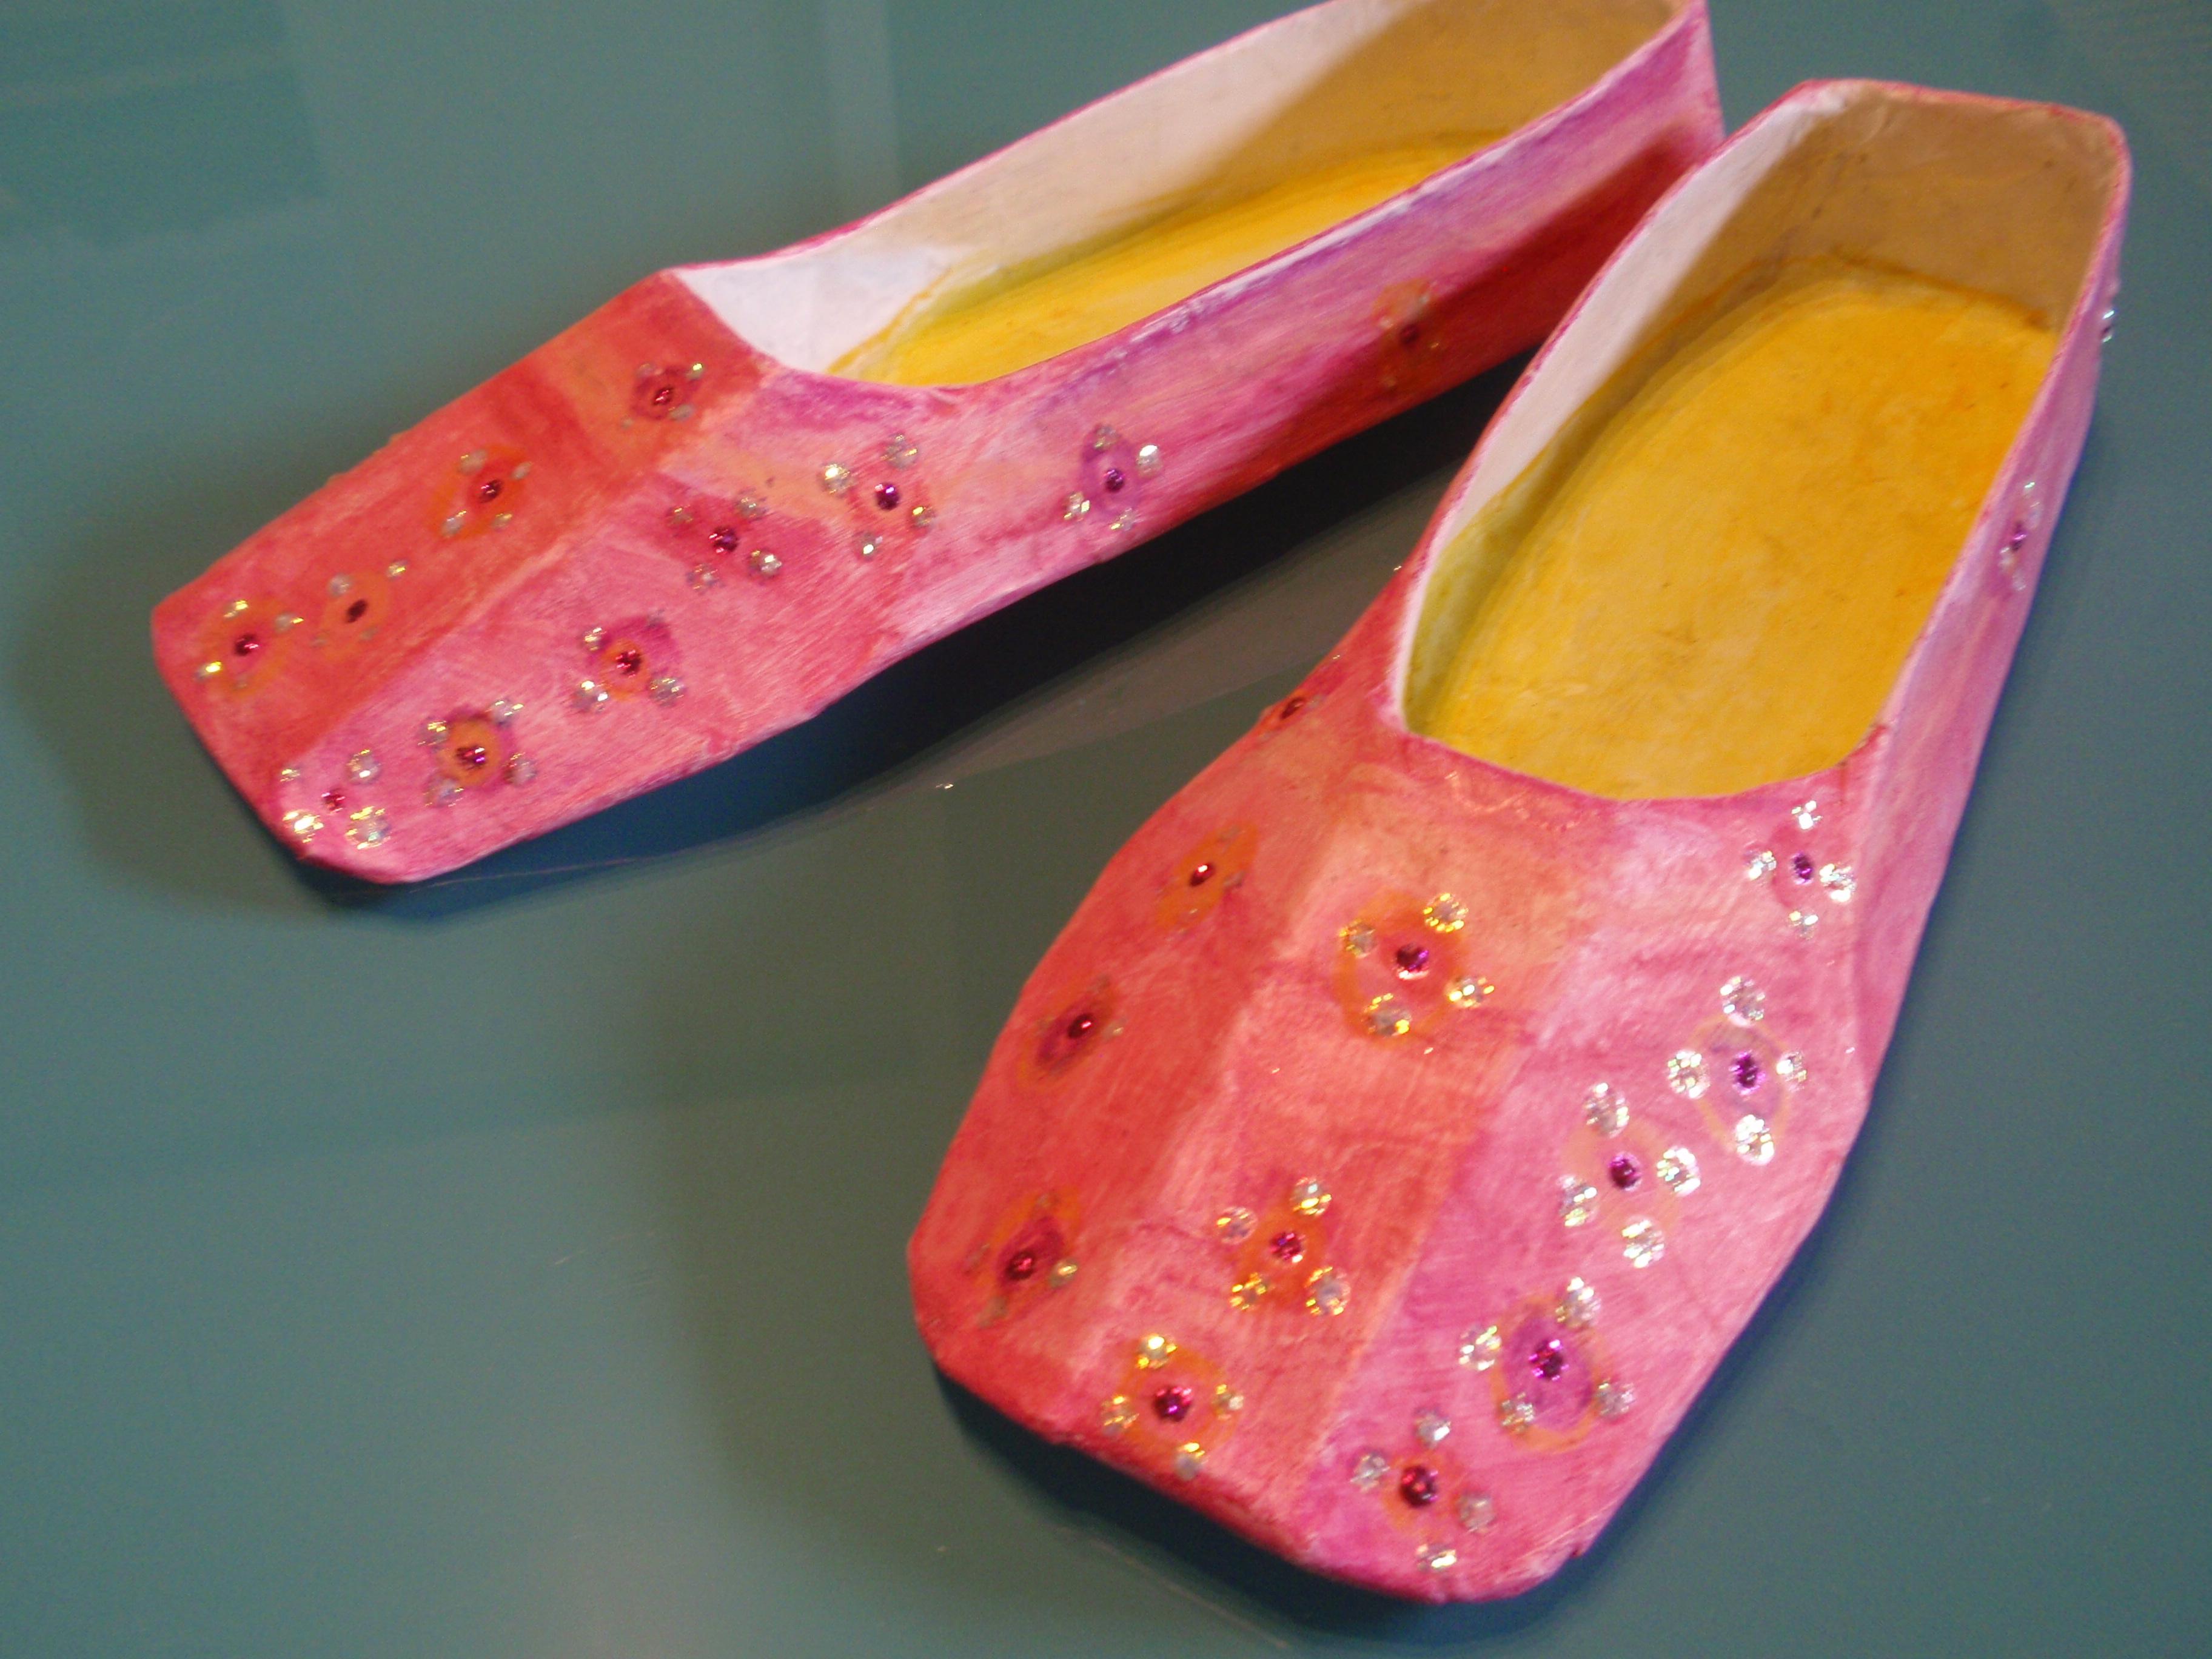 Magic carpet slippers